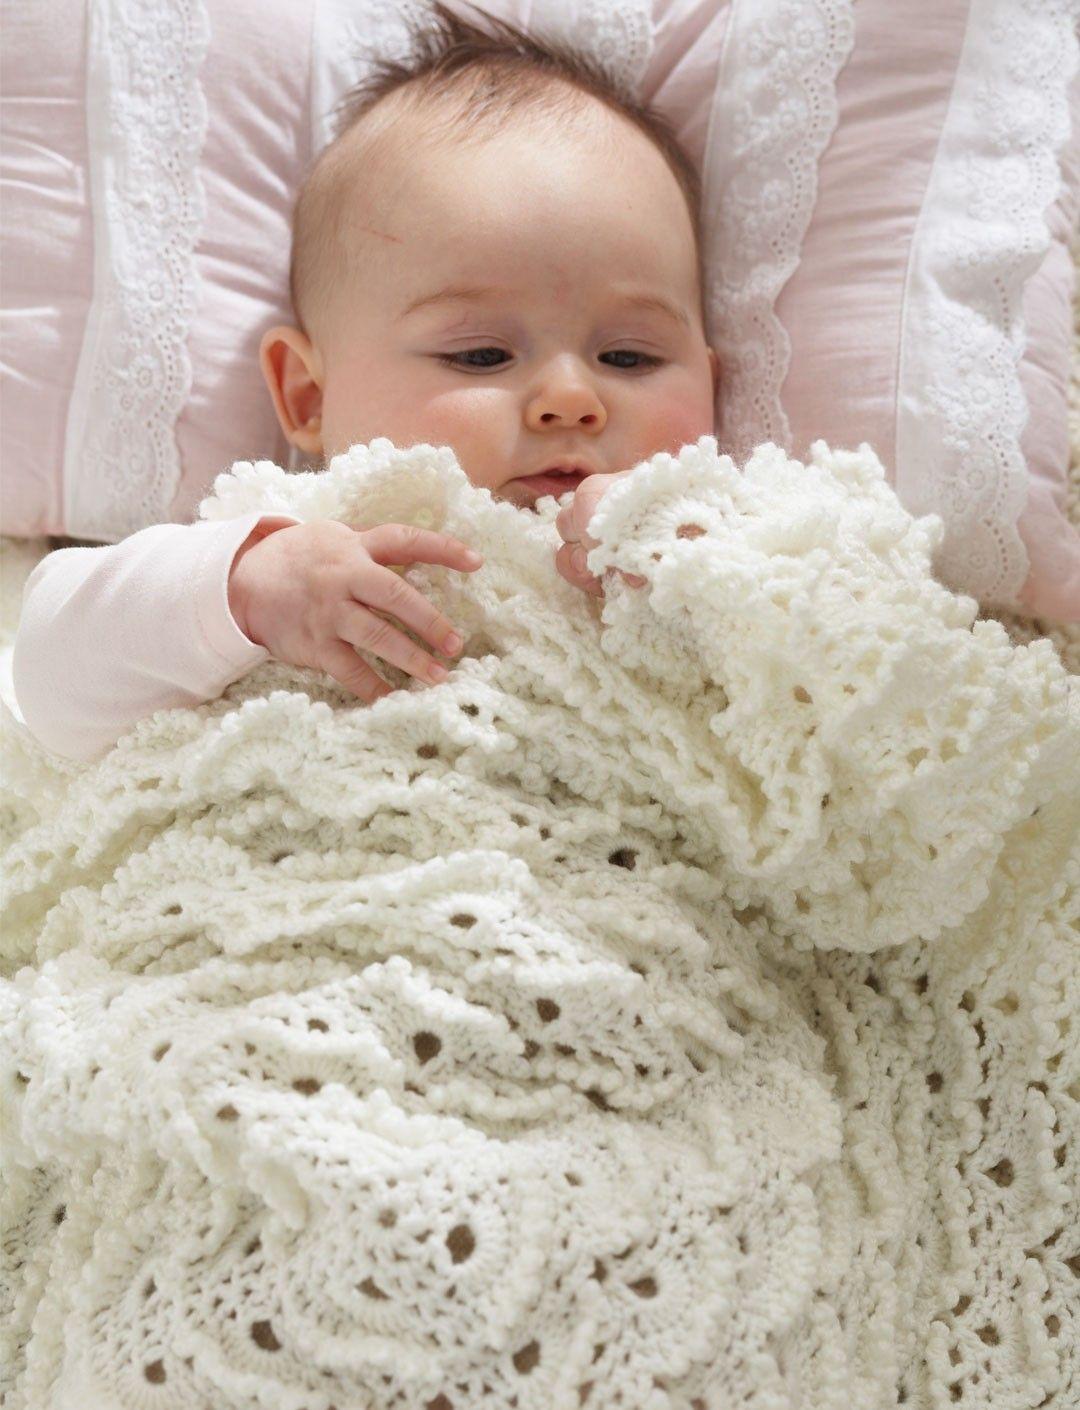 Fluffy Meringue Stitch Blanket   Crochet for babies   Pinterest ...